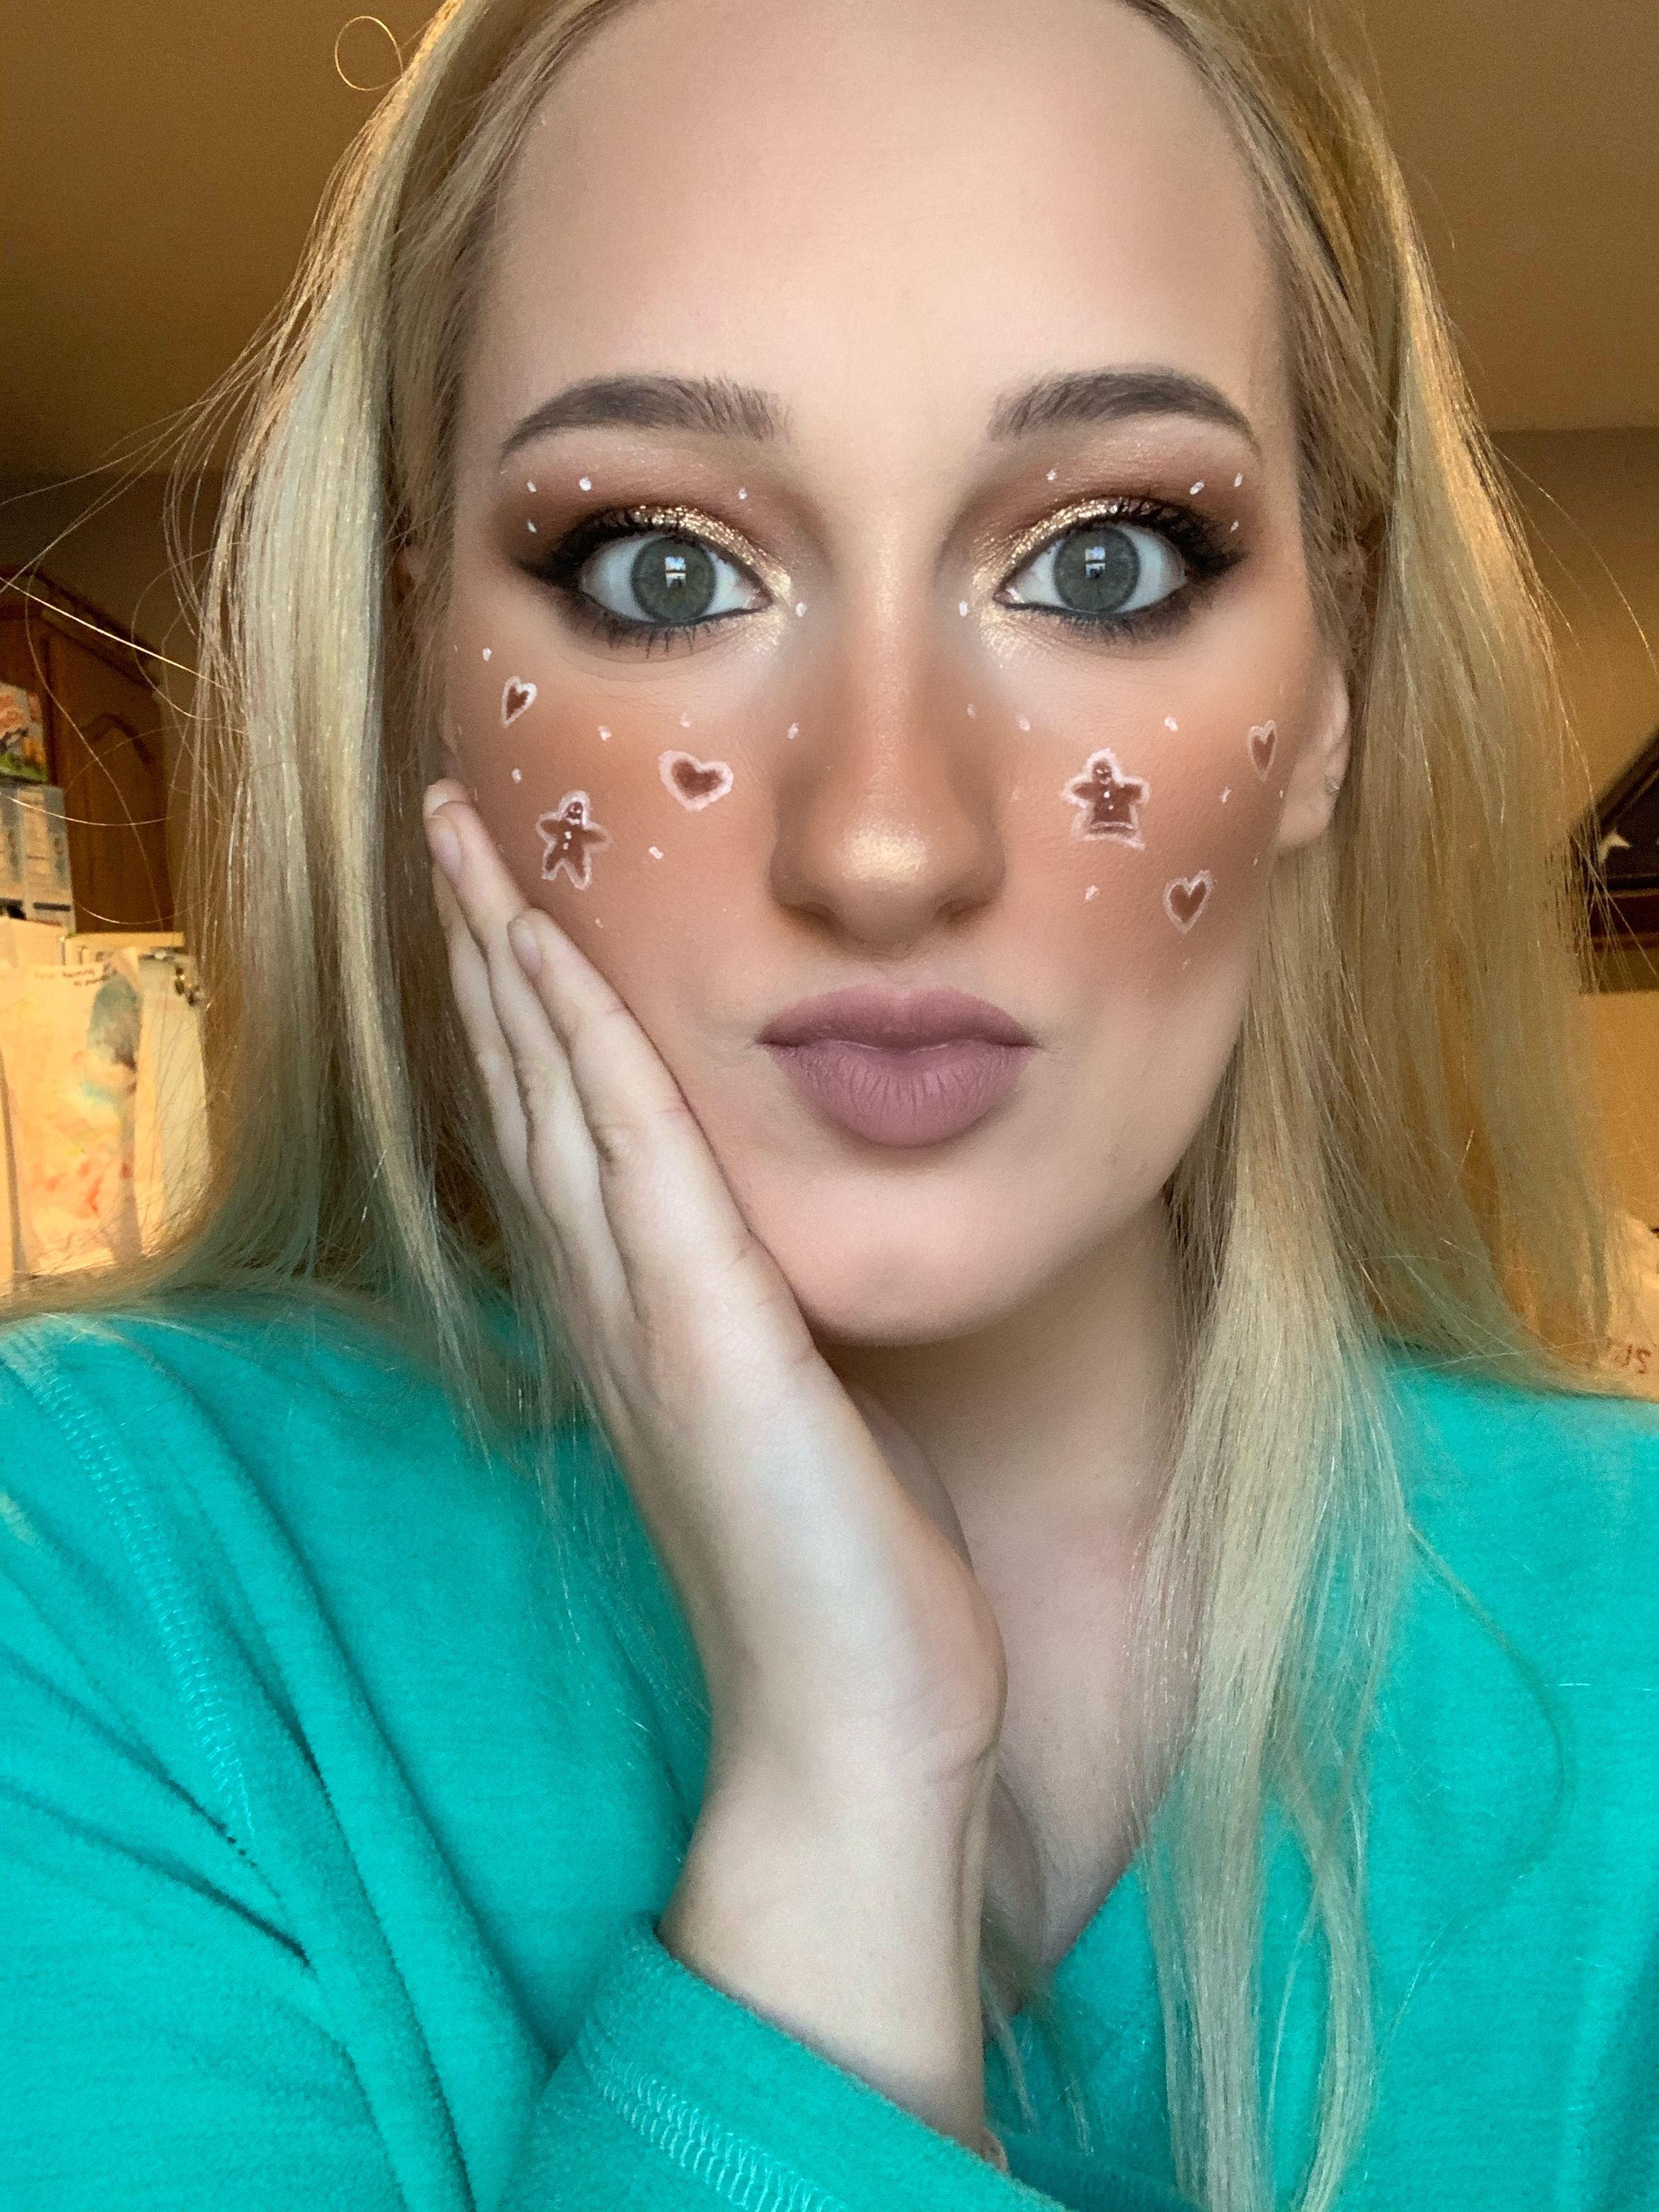 Gingerbread Makeup / Christmas Makeup in 2020 Christmas